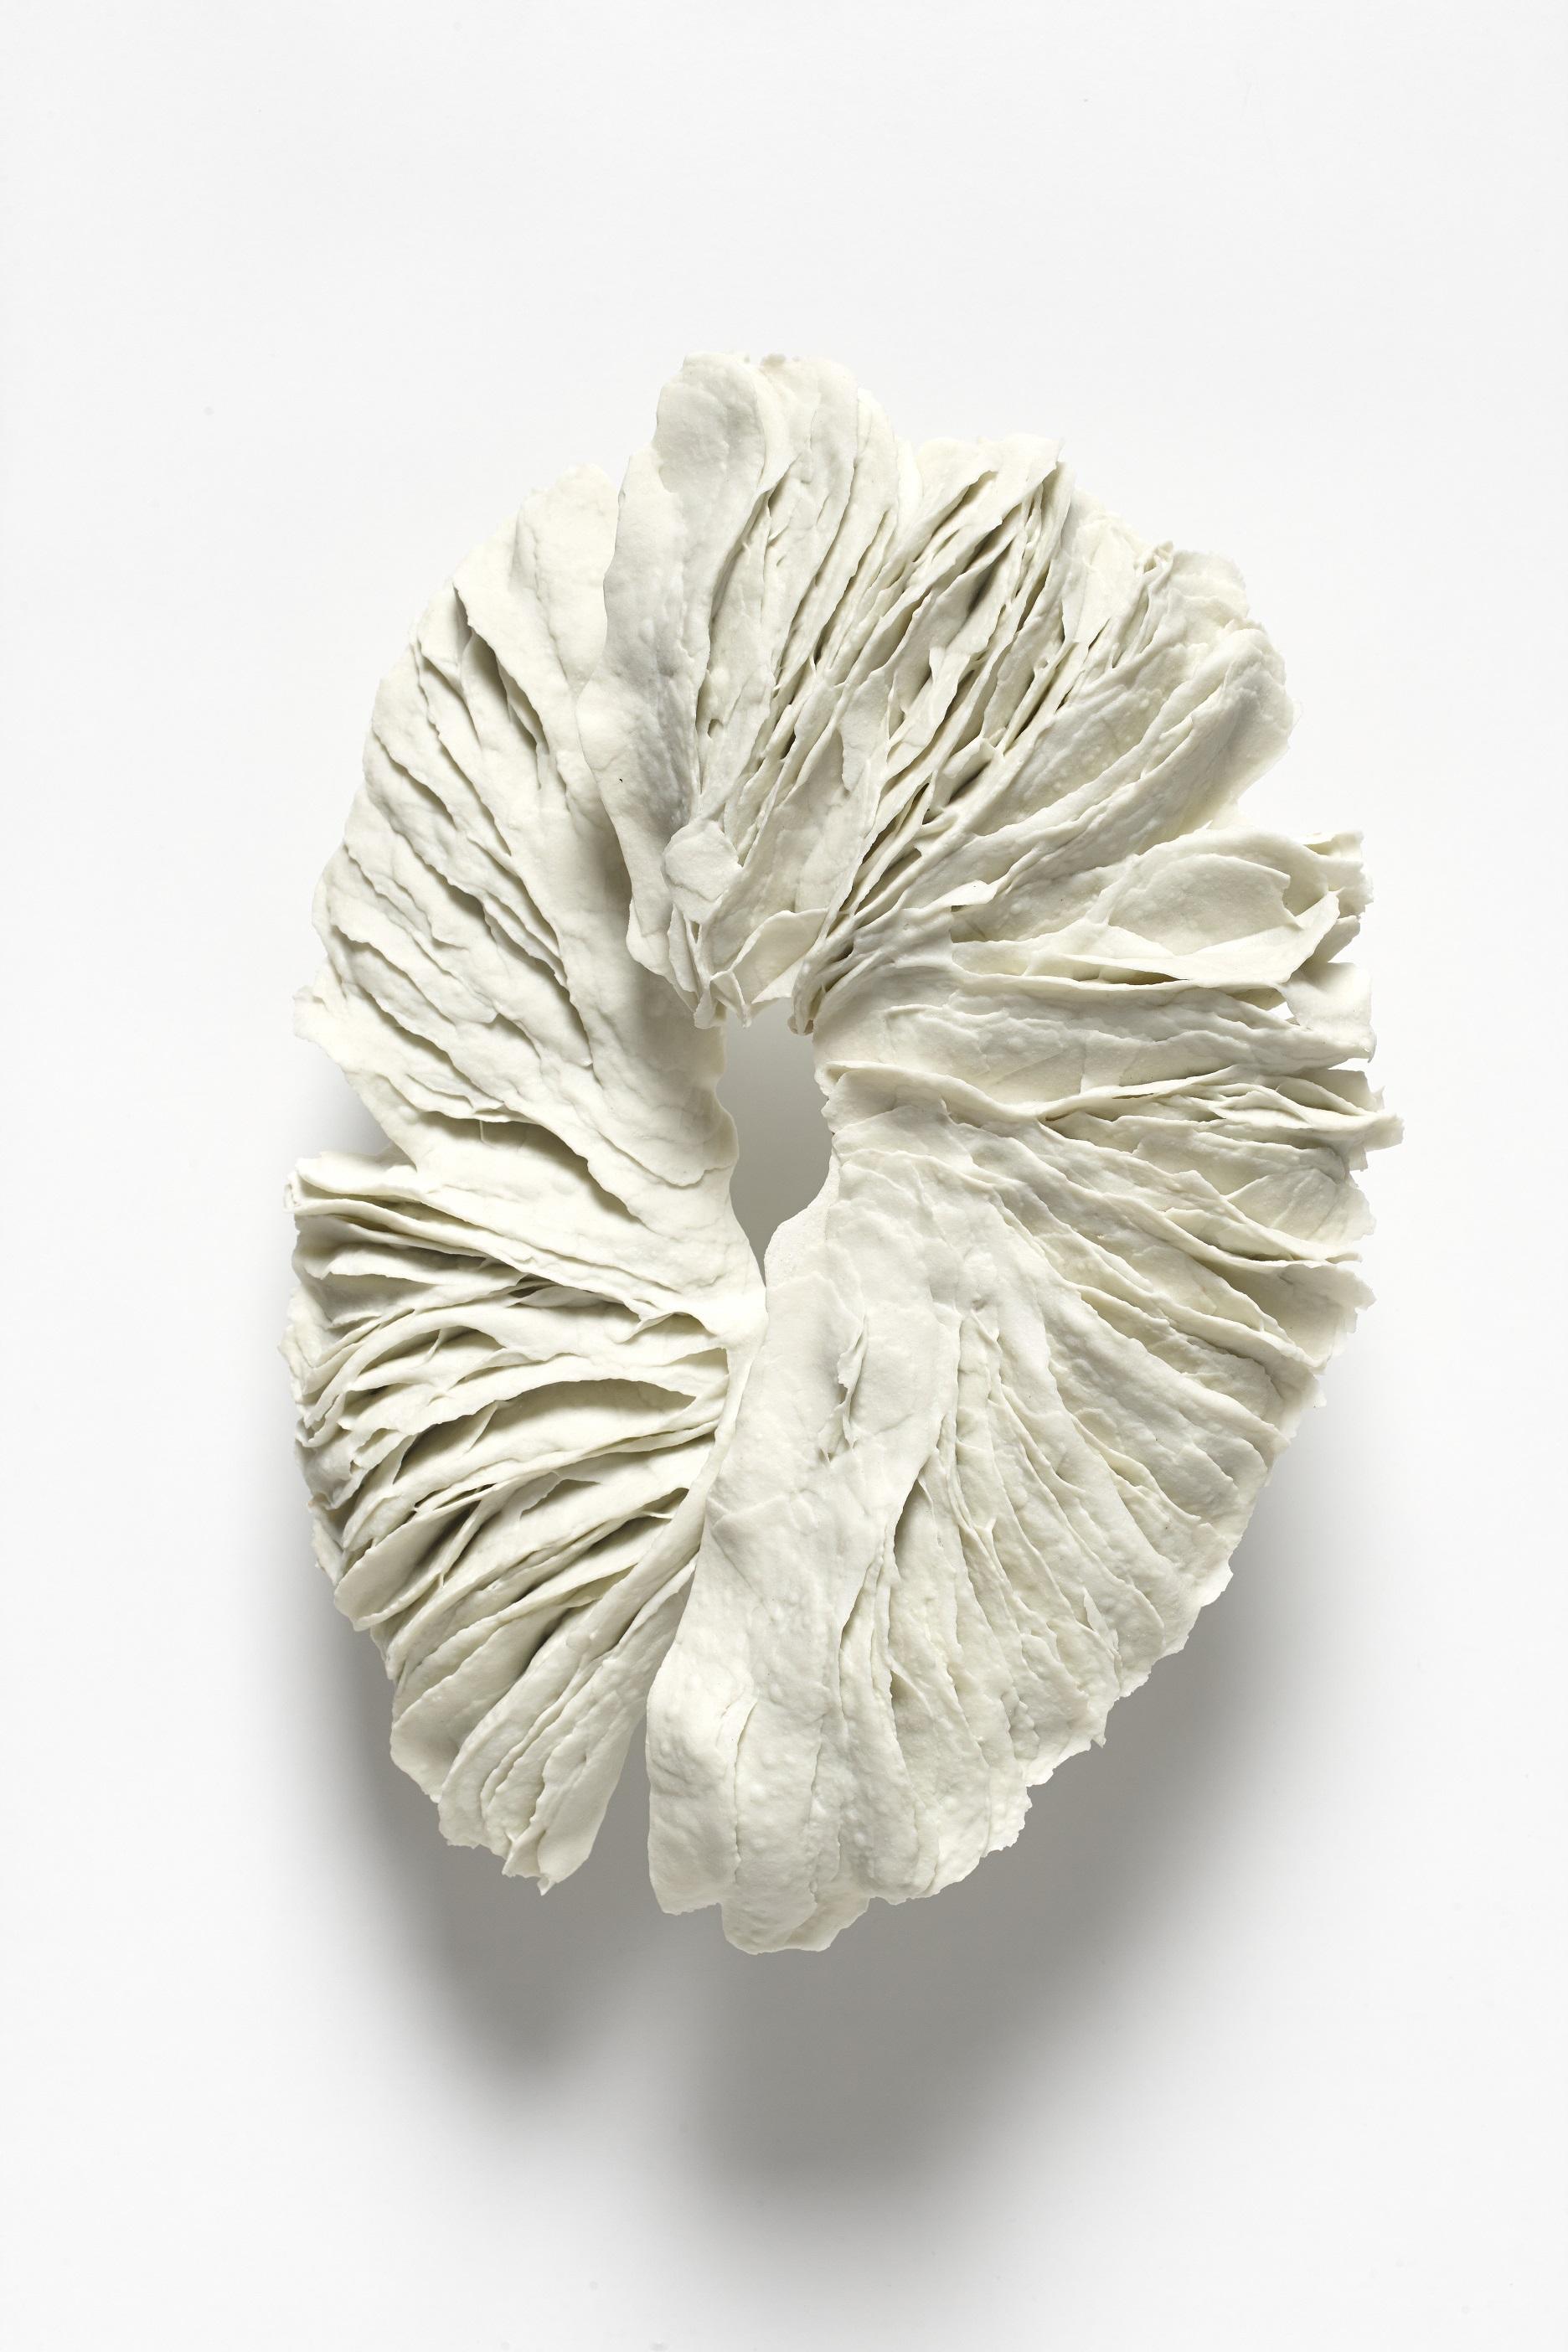 Untitled,  2012, artist blend glaze material, 35cm x 27cm x 4cm